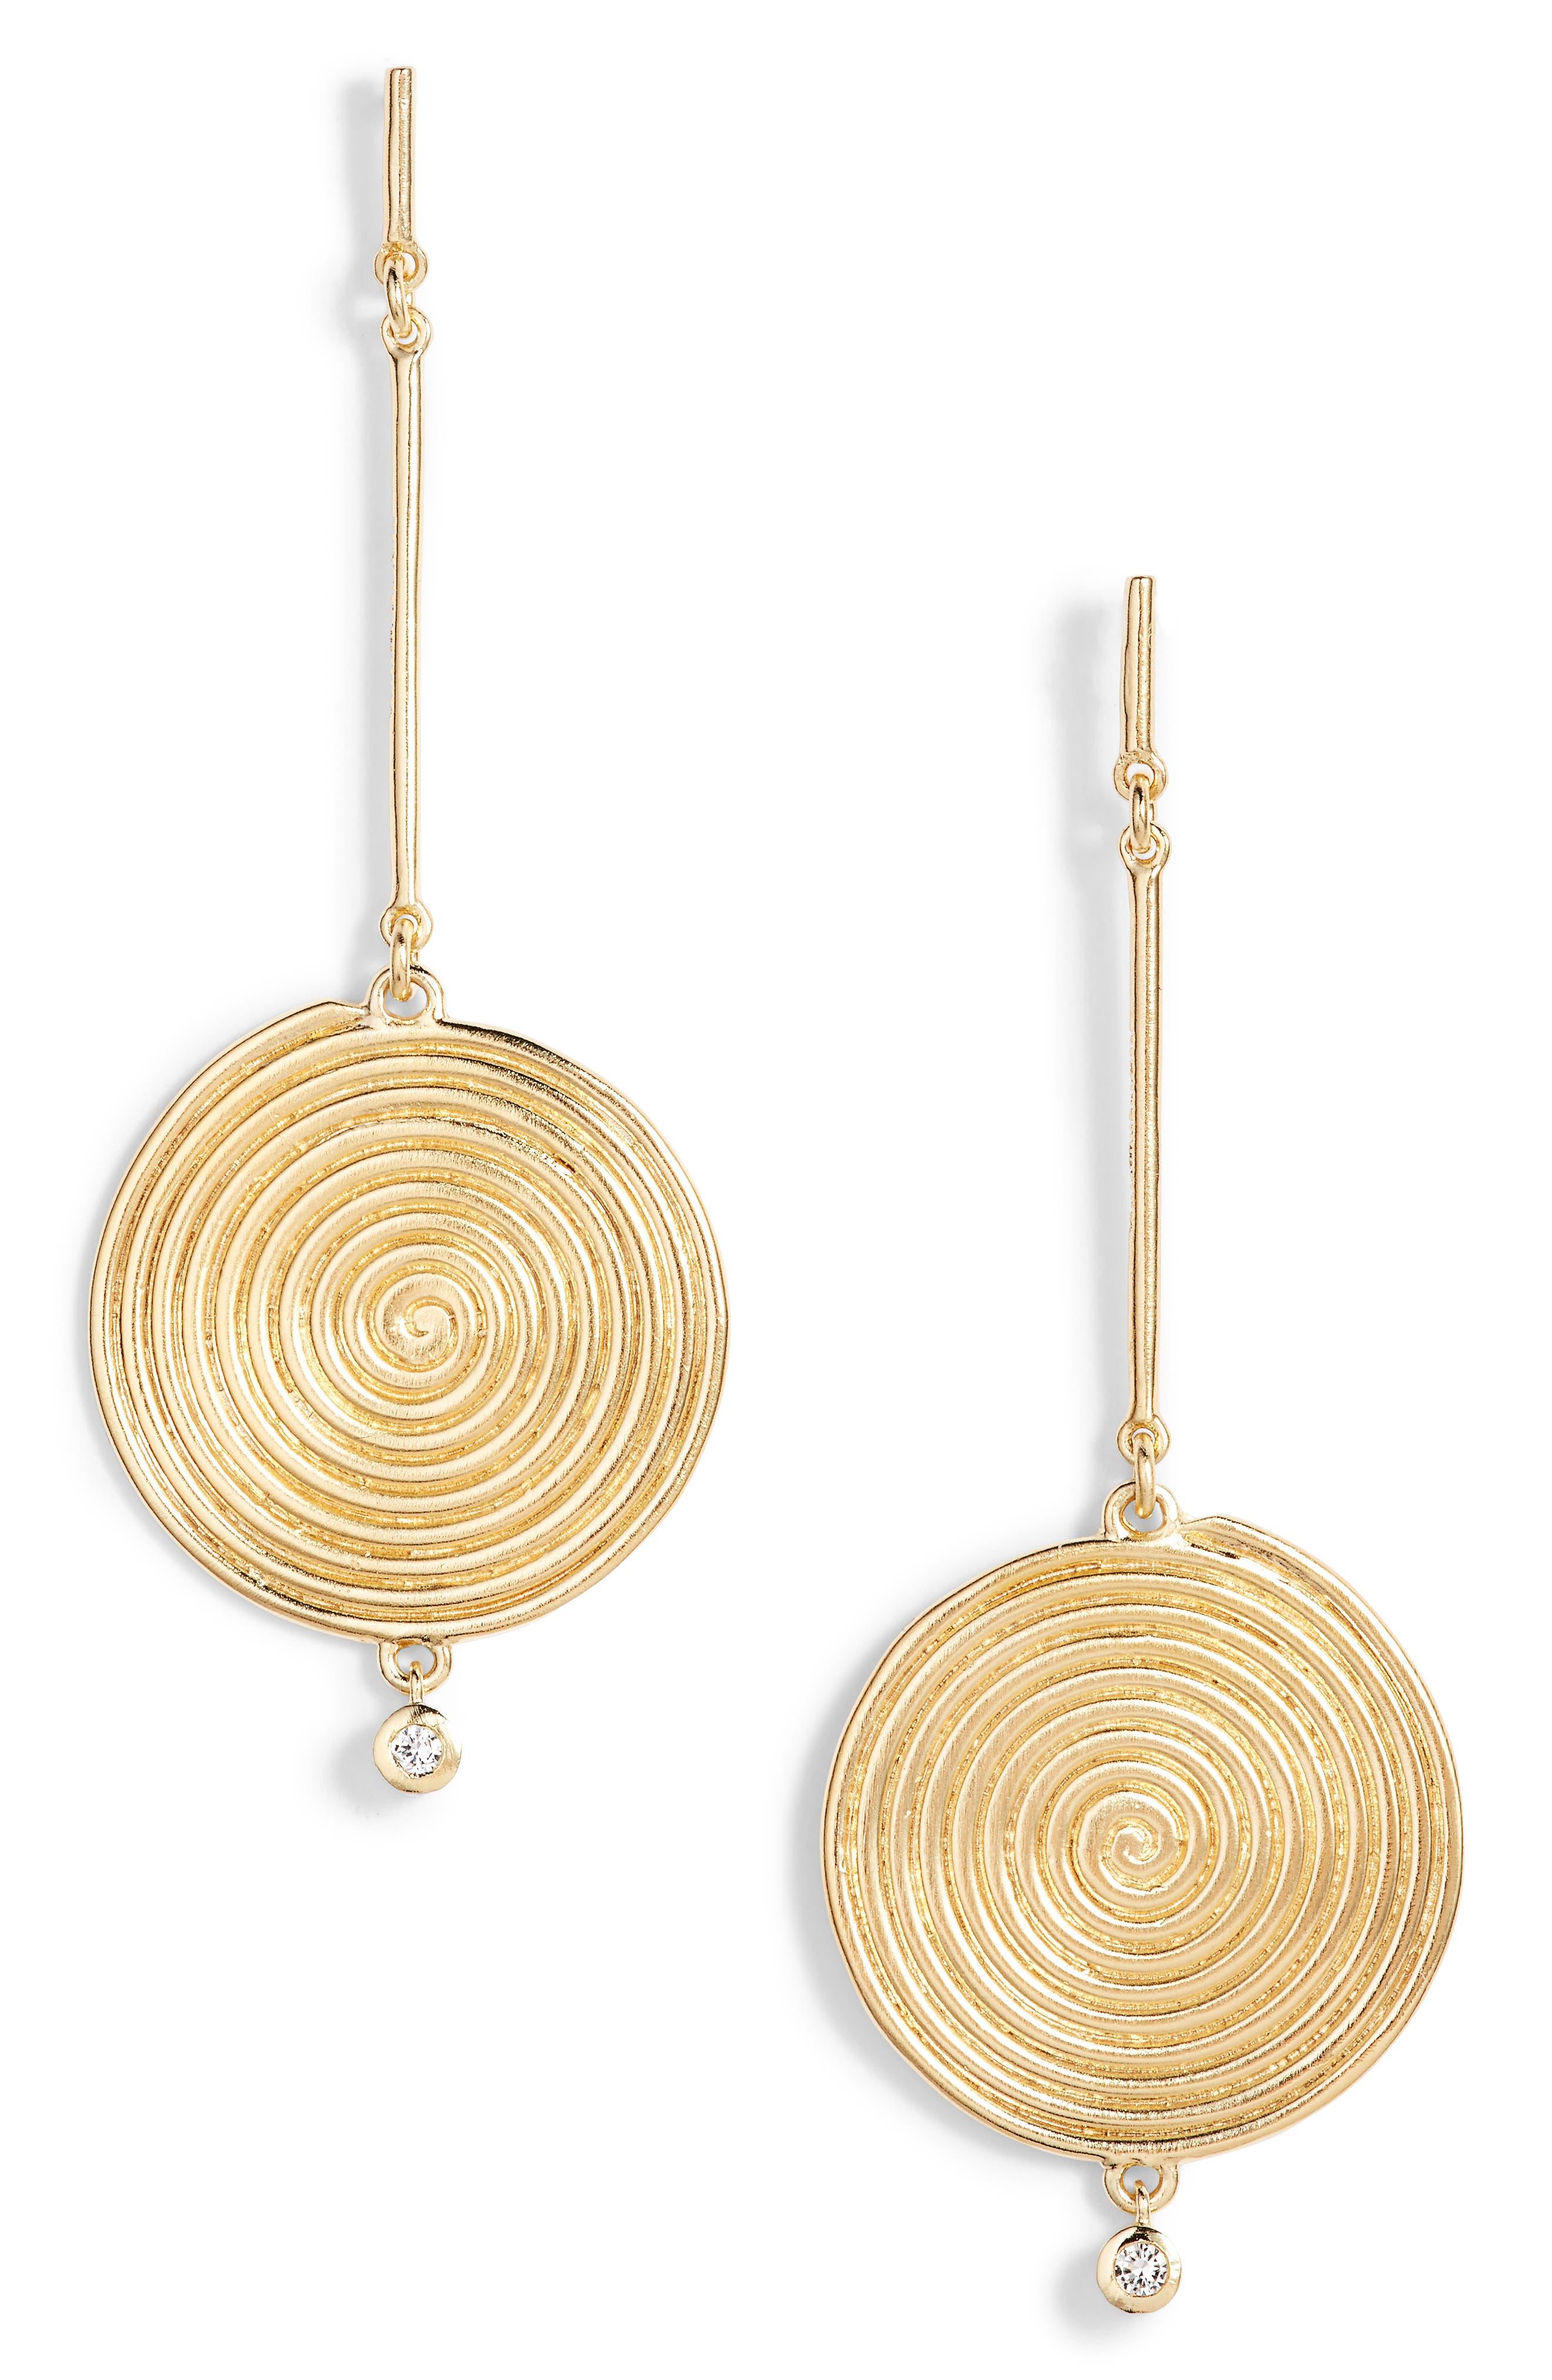 Sullivan - Lainey White Topaz Drop Earrings,                         Main,                         color, 715